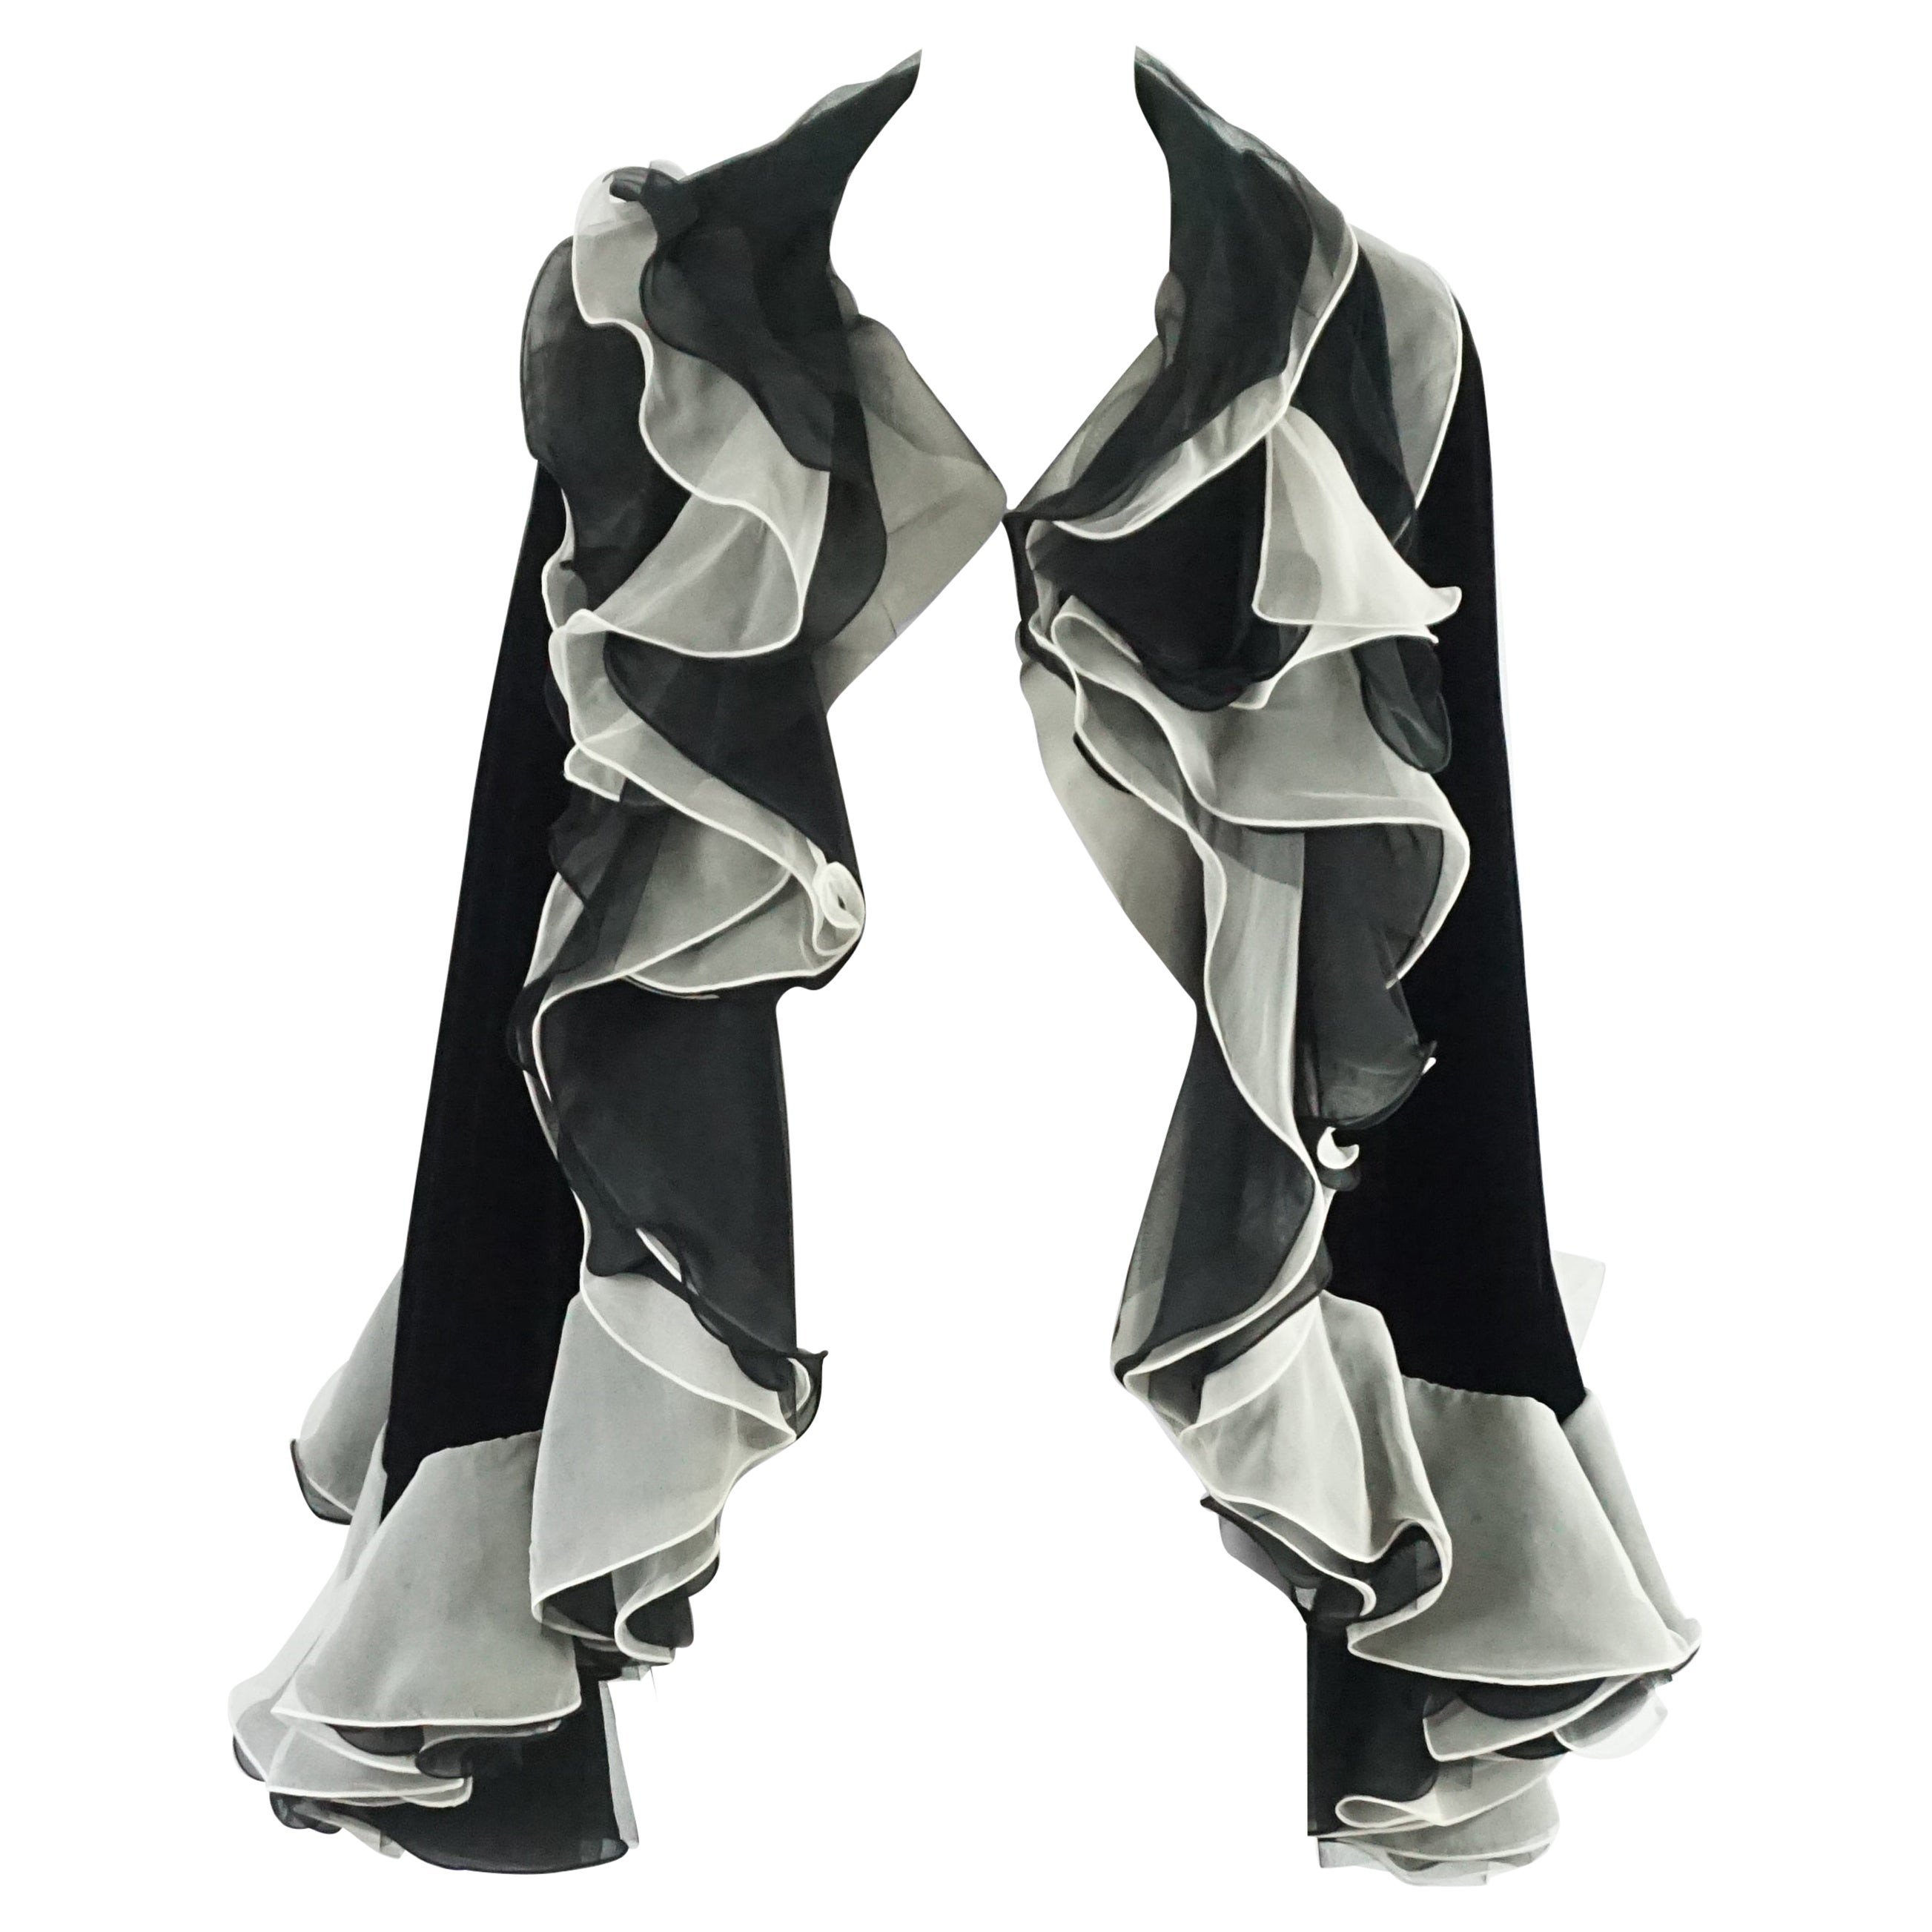 STAIN Armani Black Velvet Cape with White Silk Pleated Trim - OS